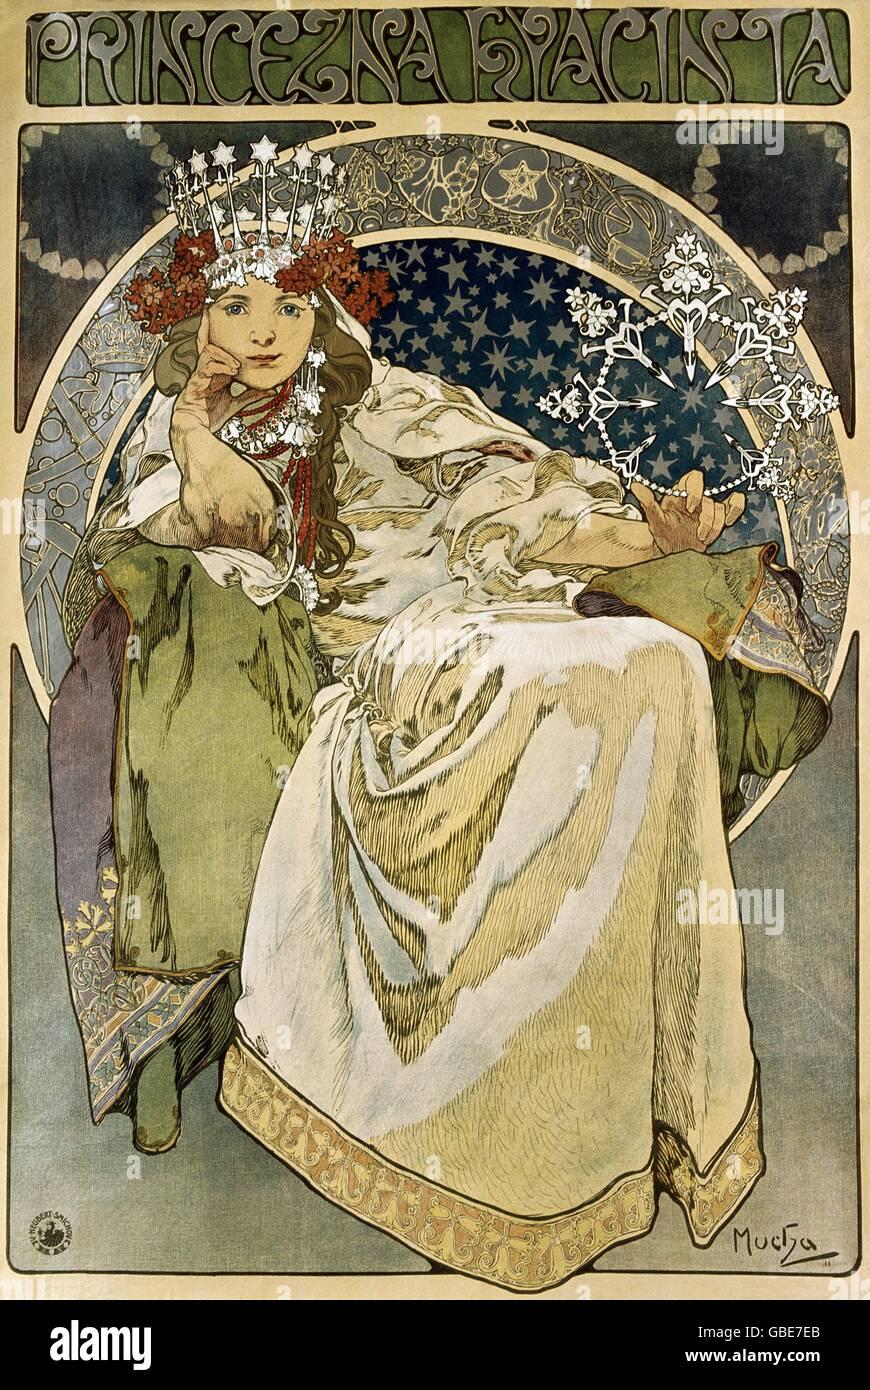 "fine arts, Mucha, Alfons (1860 - 1939), poster, ""Princezna Hyacinia"" (Princess Hyacinth), lithograph, 1911, Stock Photo"